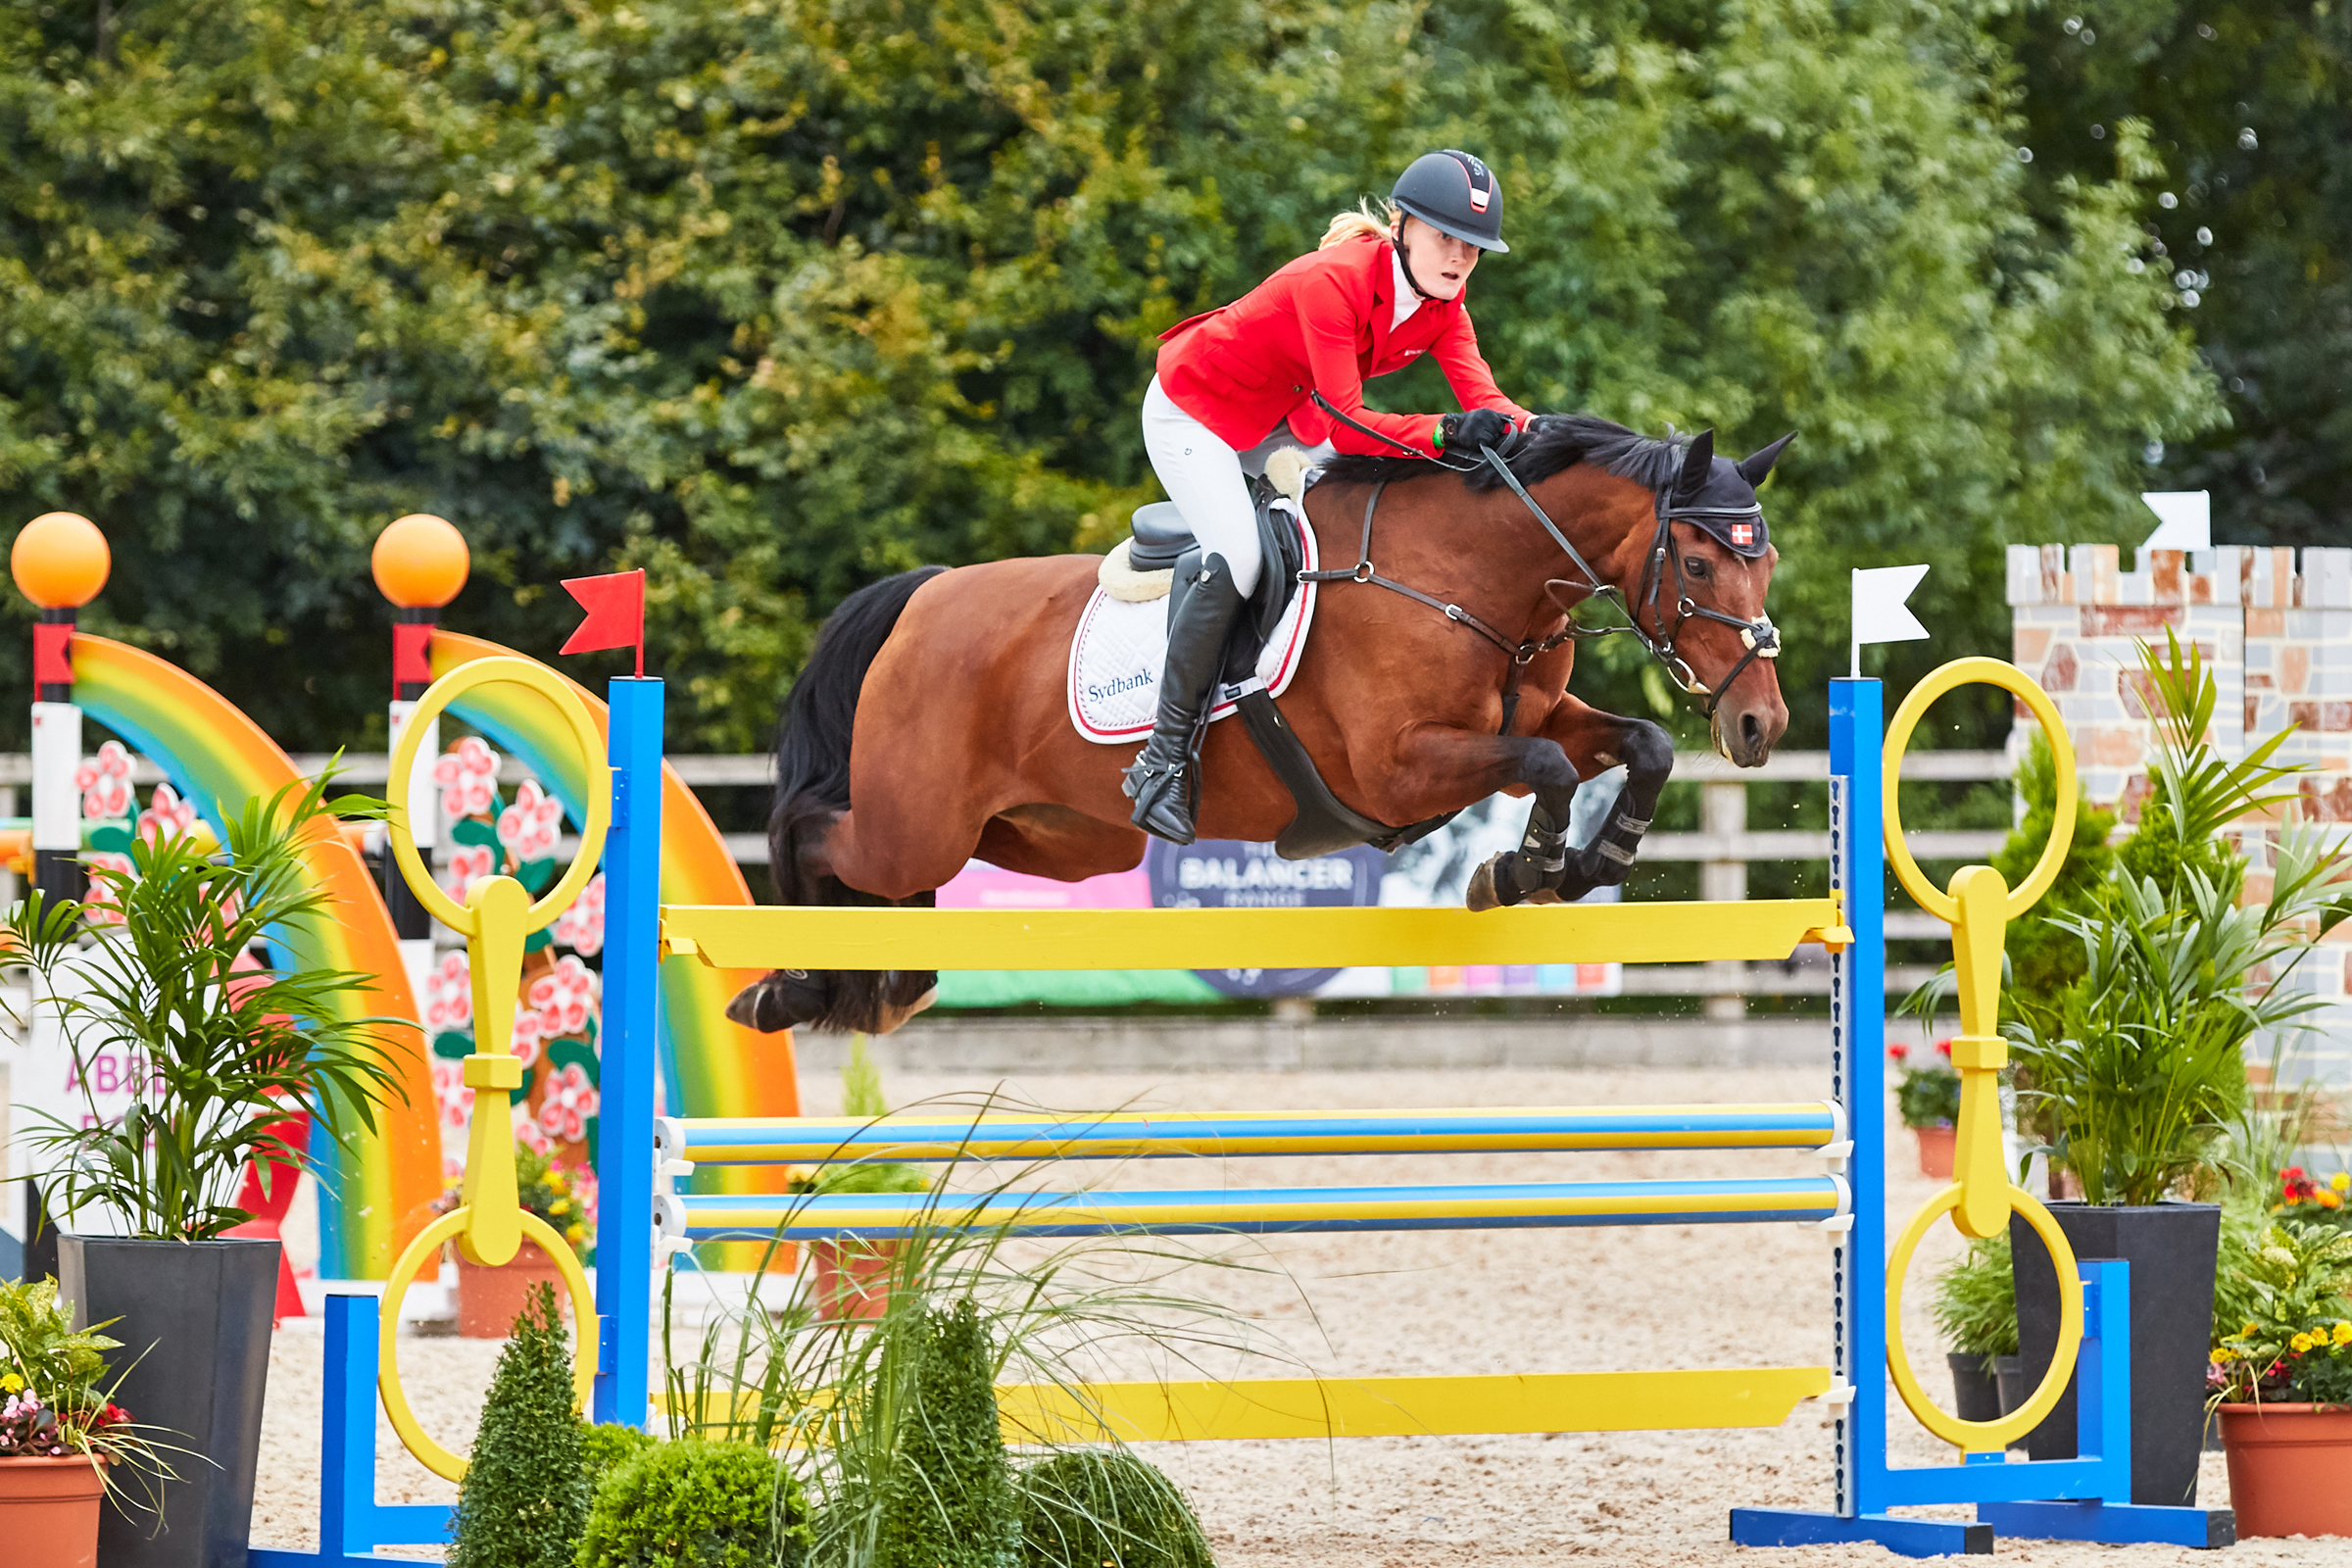 Maria Noerregaard LanghoffFei European Championships